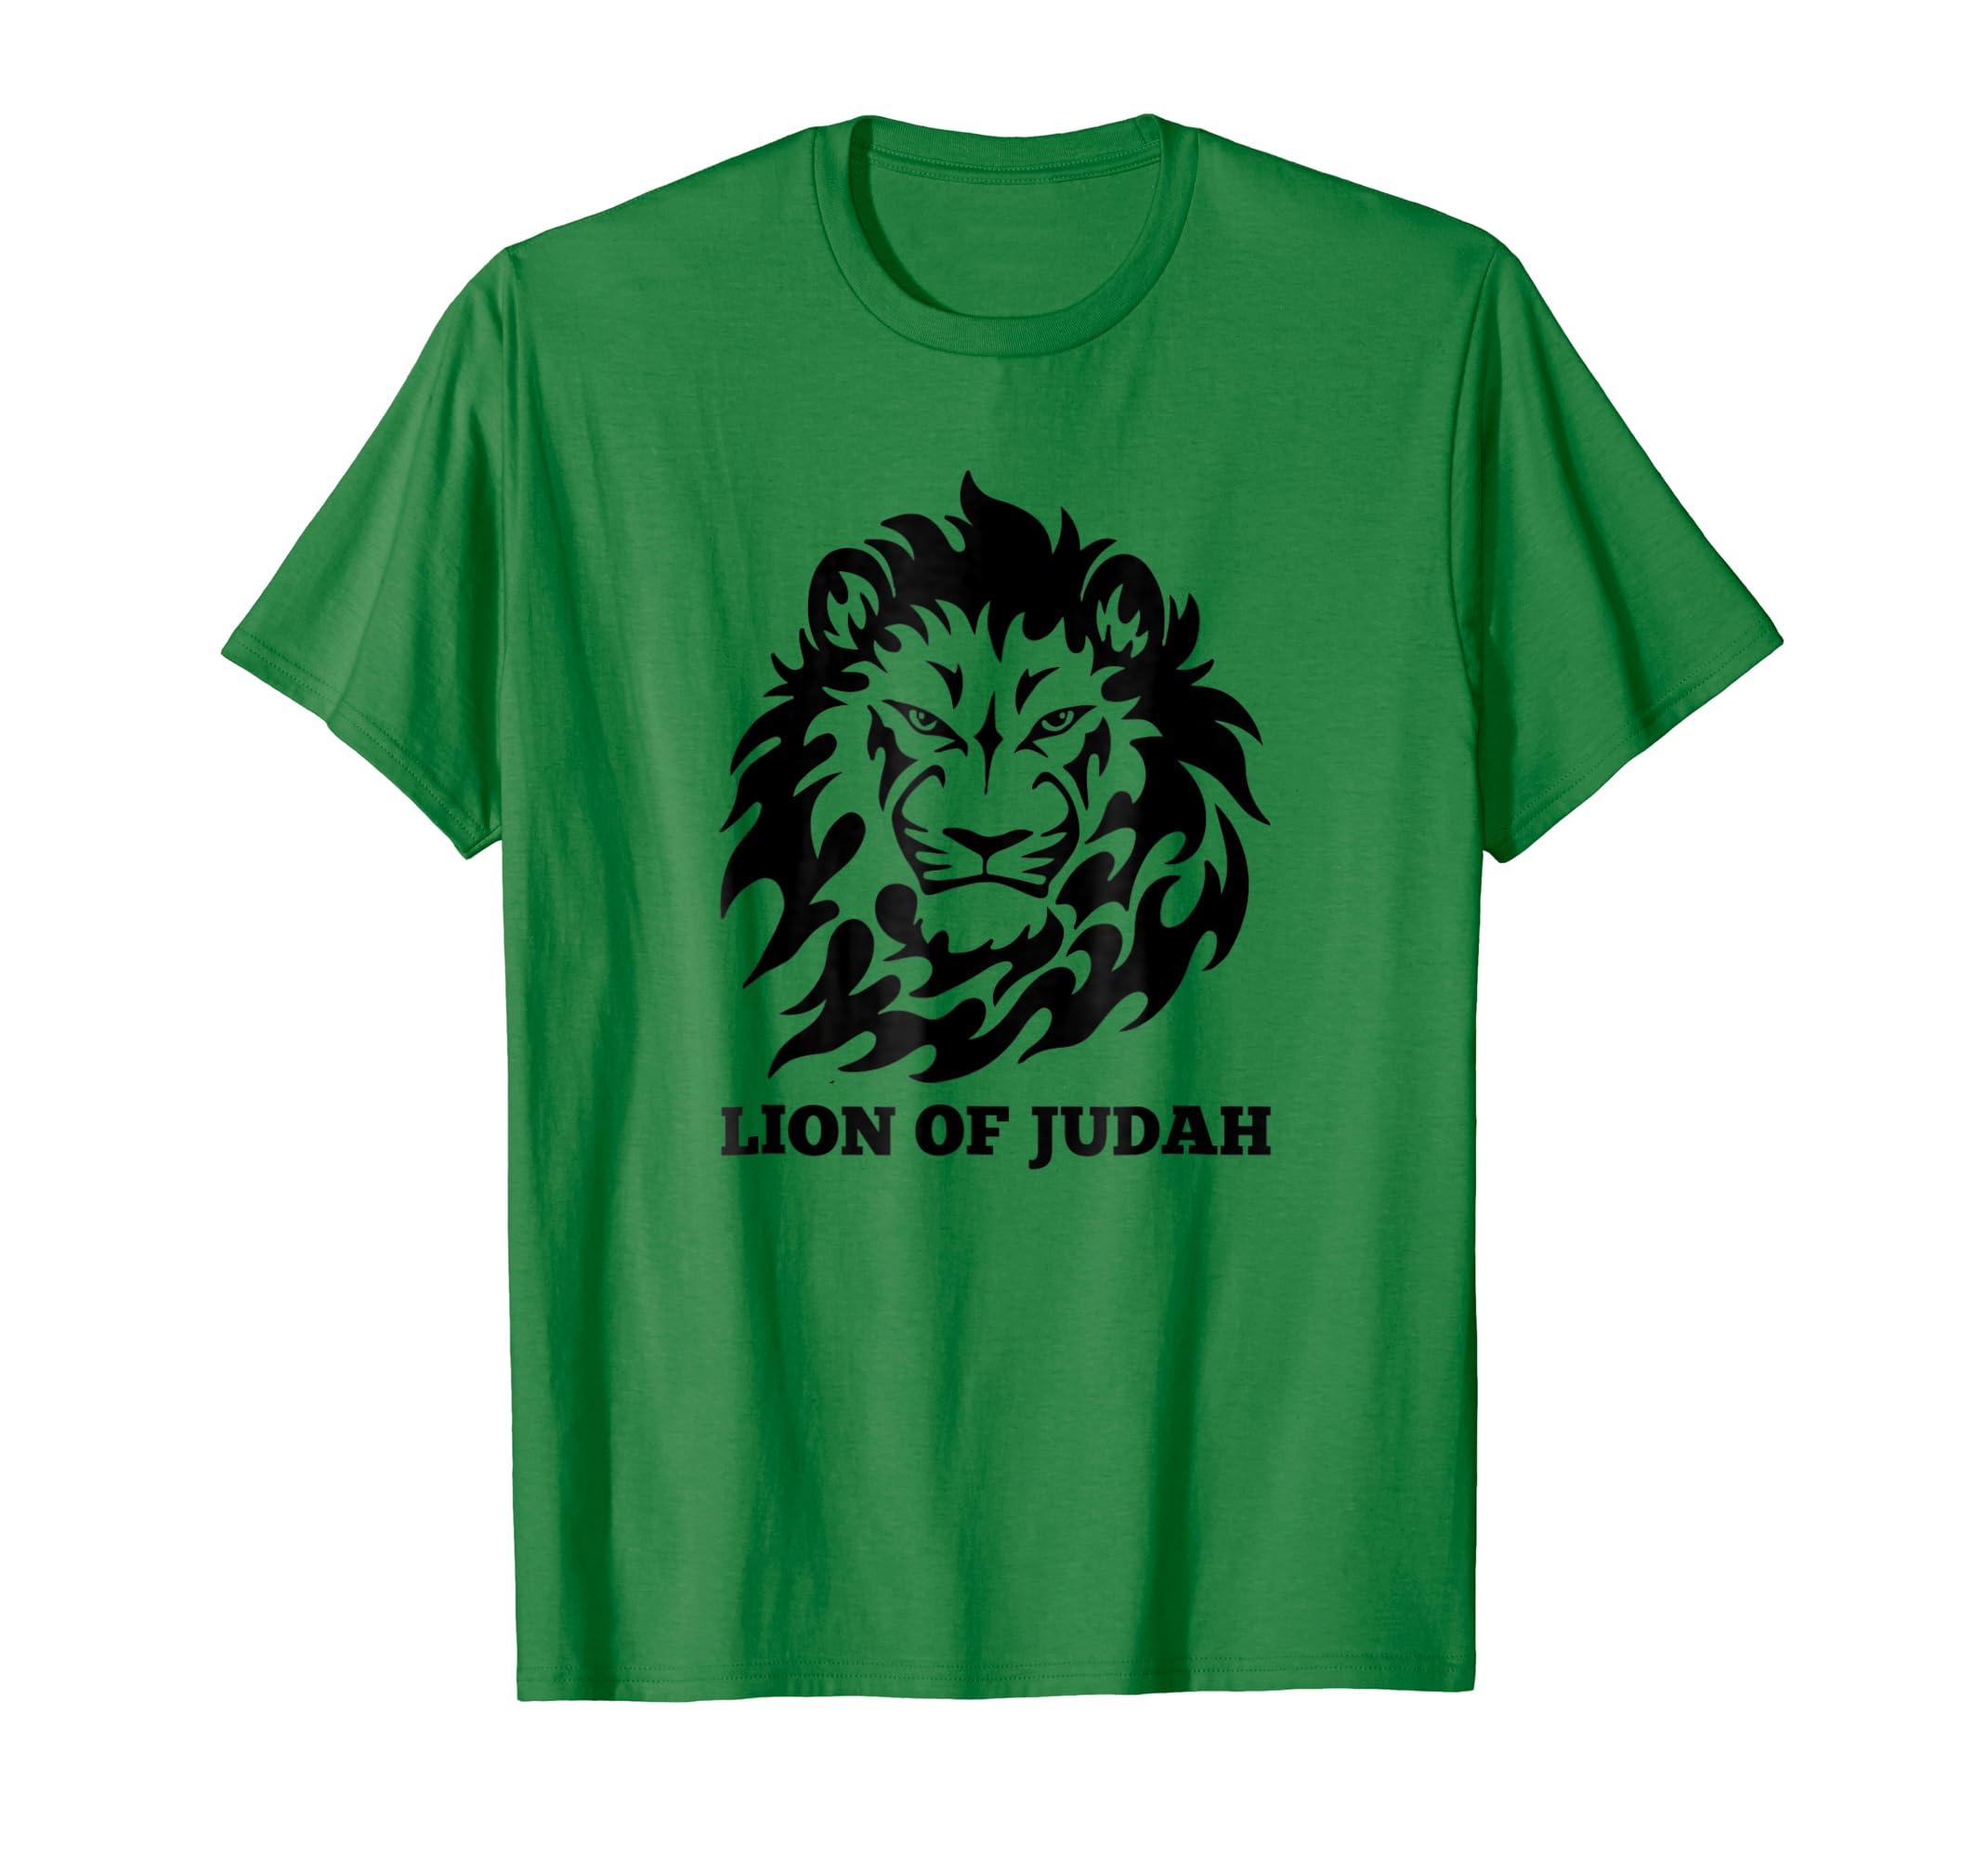 91a26c94 Amazon.com: Jesus The Lion of Judah Religious Gospel Slogan Jewish Tee:  Clothing